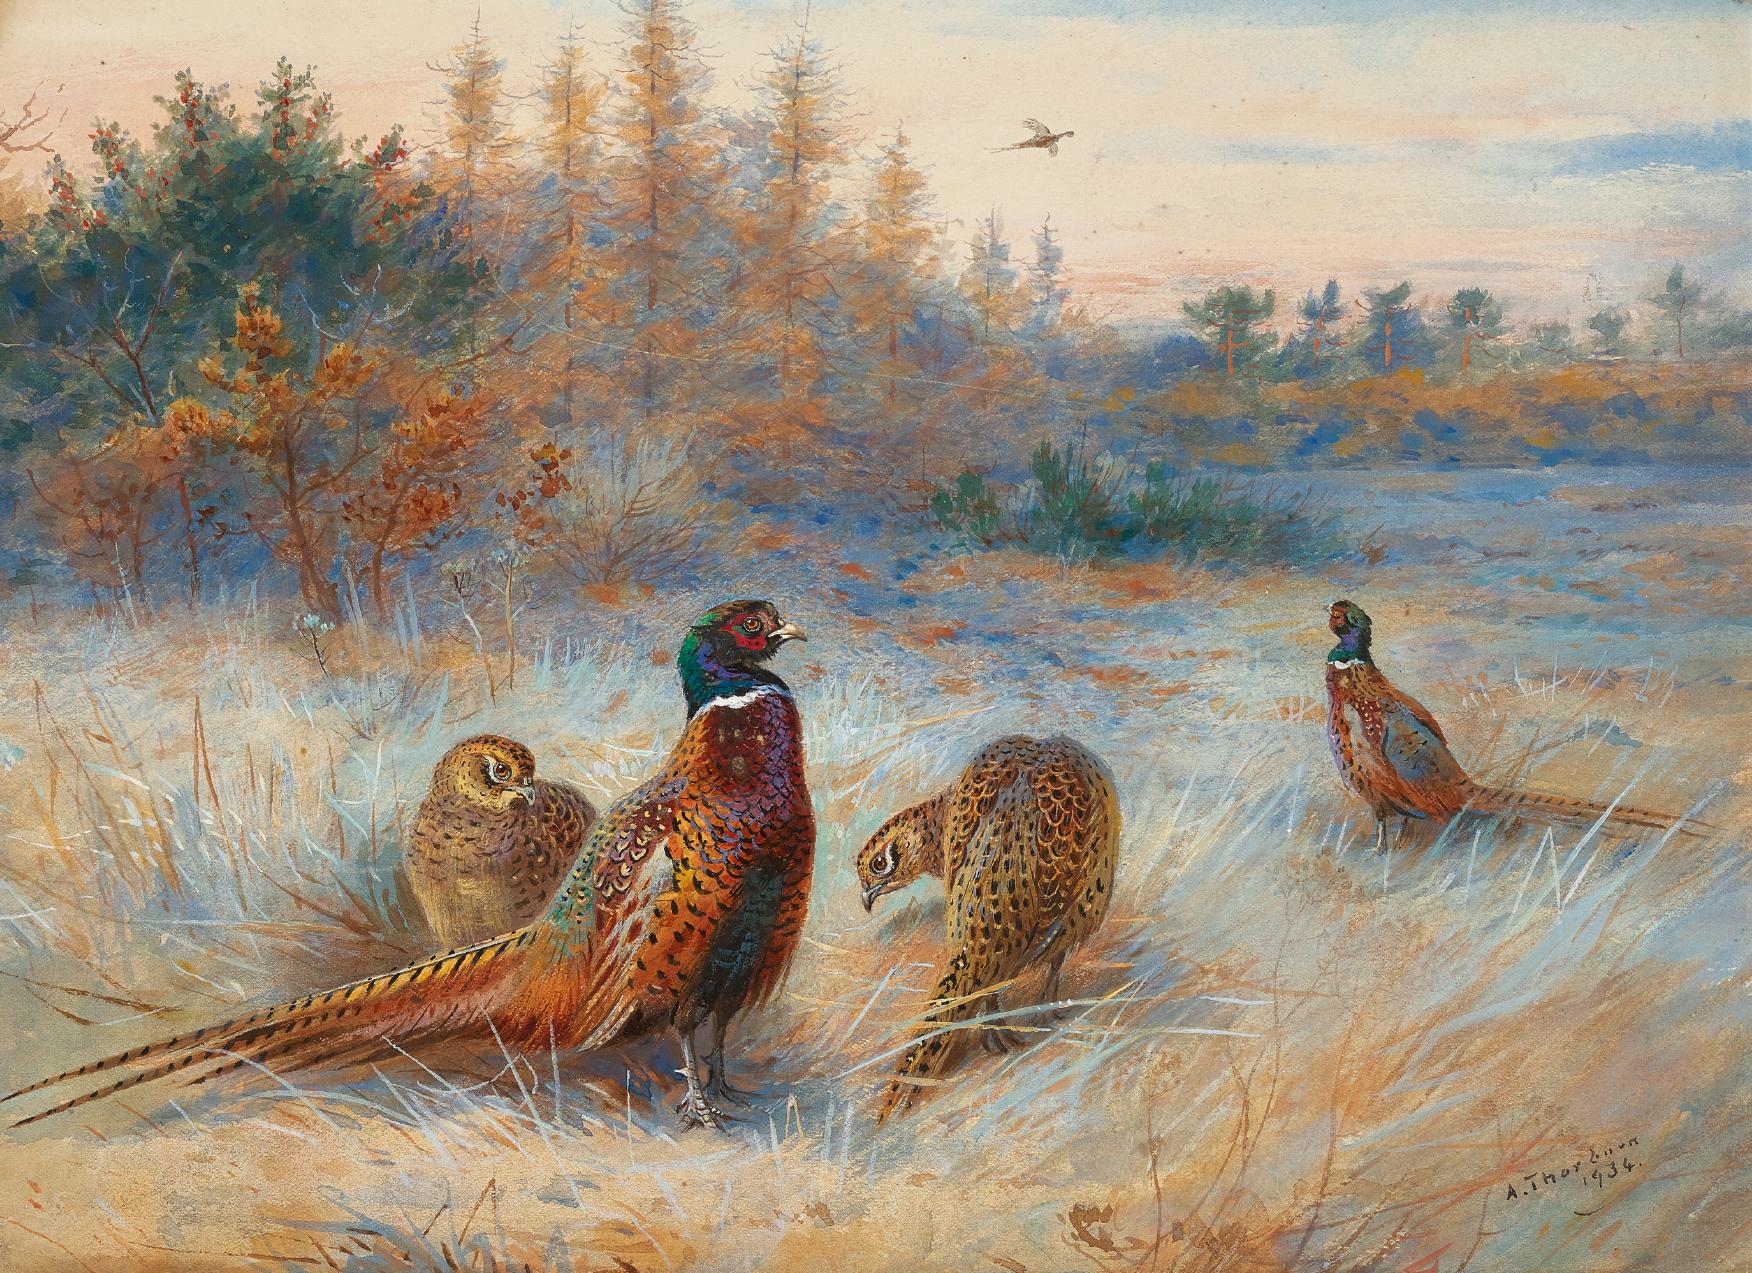 ARCHIBALD THORBURN | Autumn Dawn, Pheasants